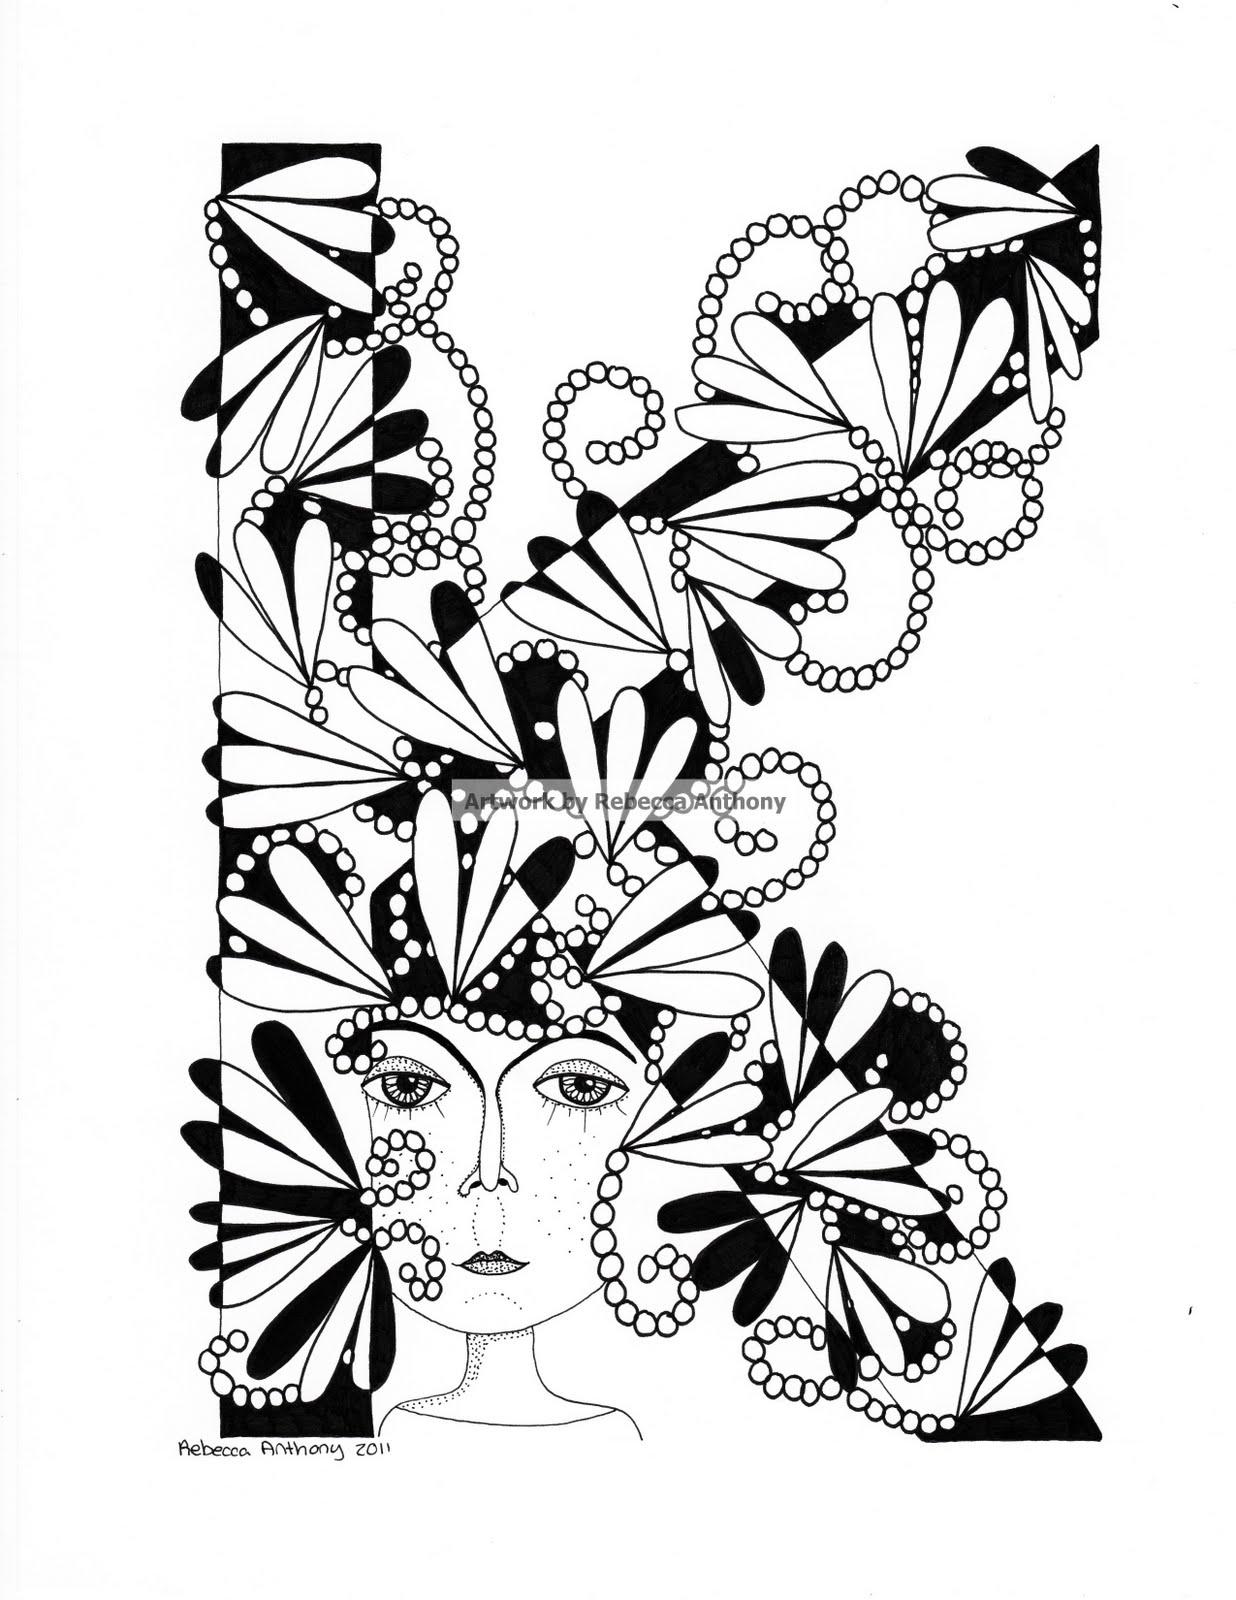 Penny lane ink lady letter g k lady letter g k thecheapjerseys Choice Image